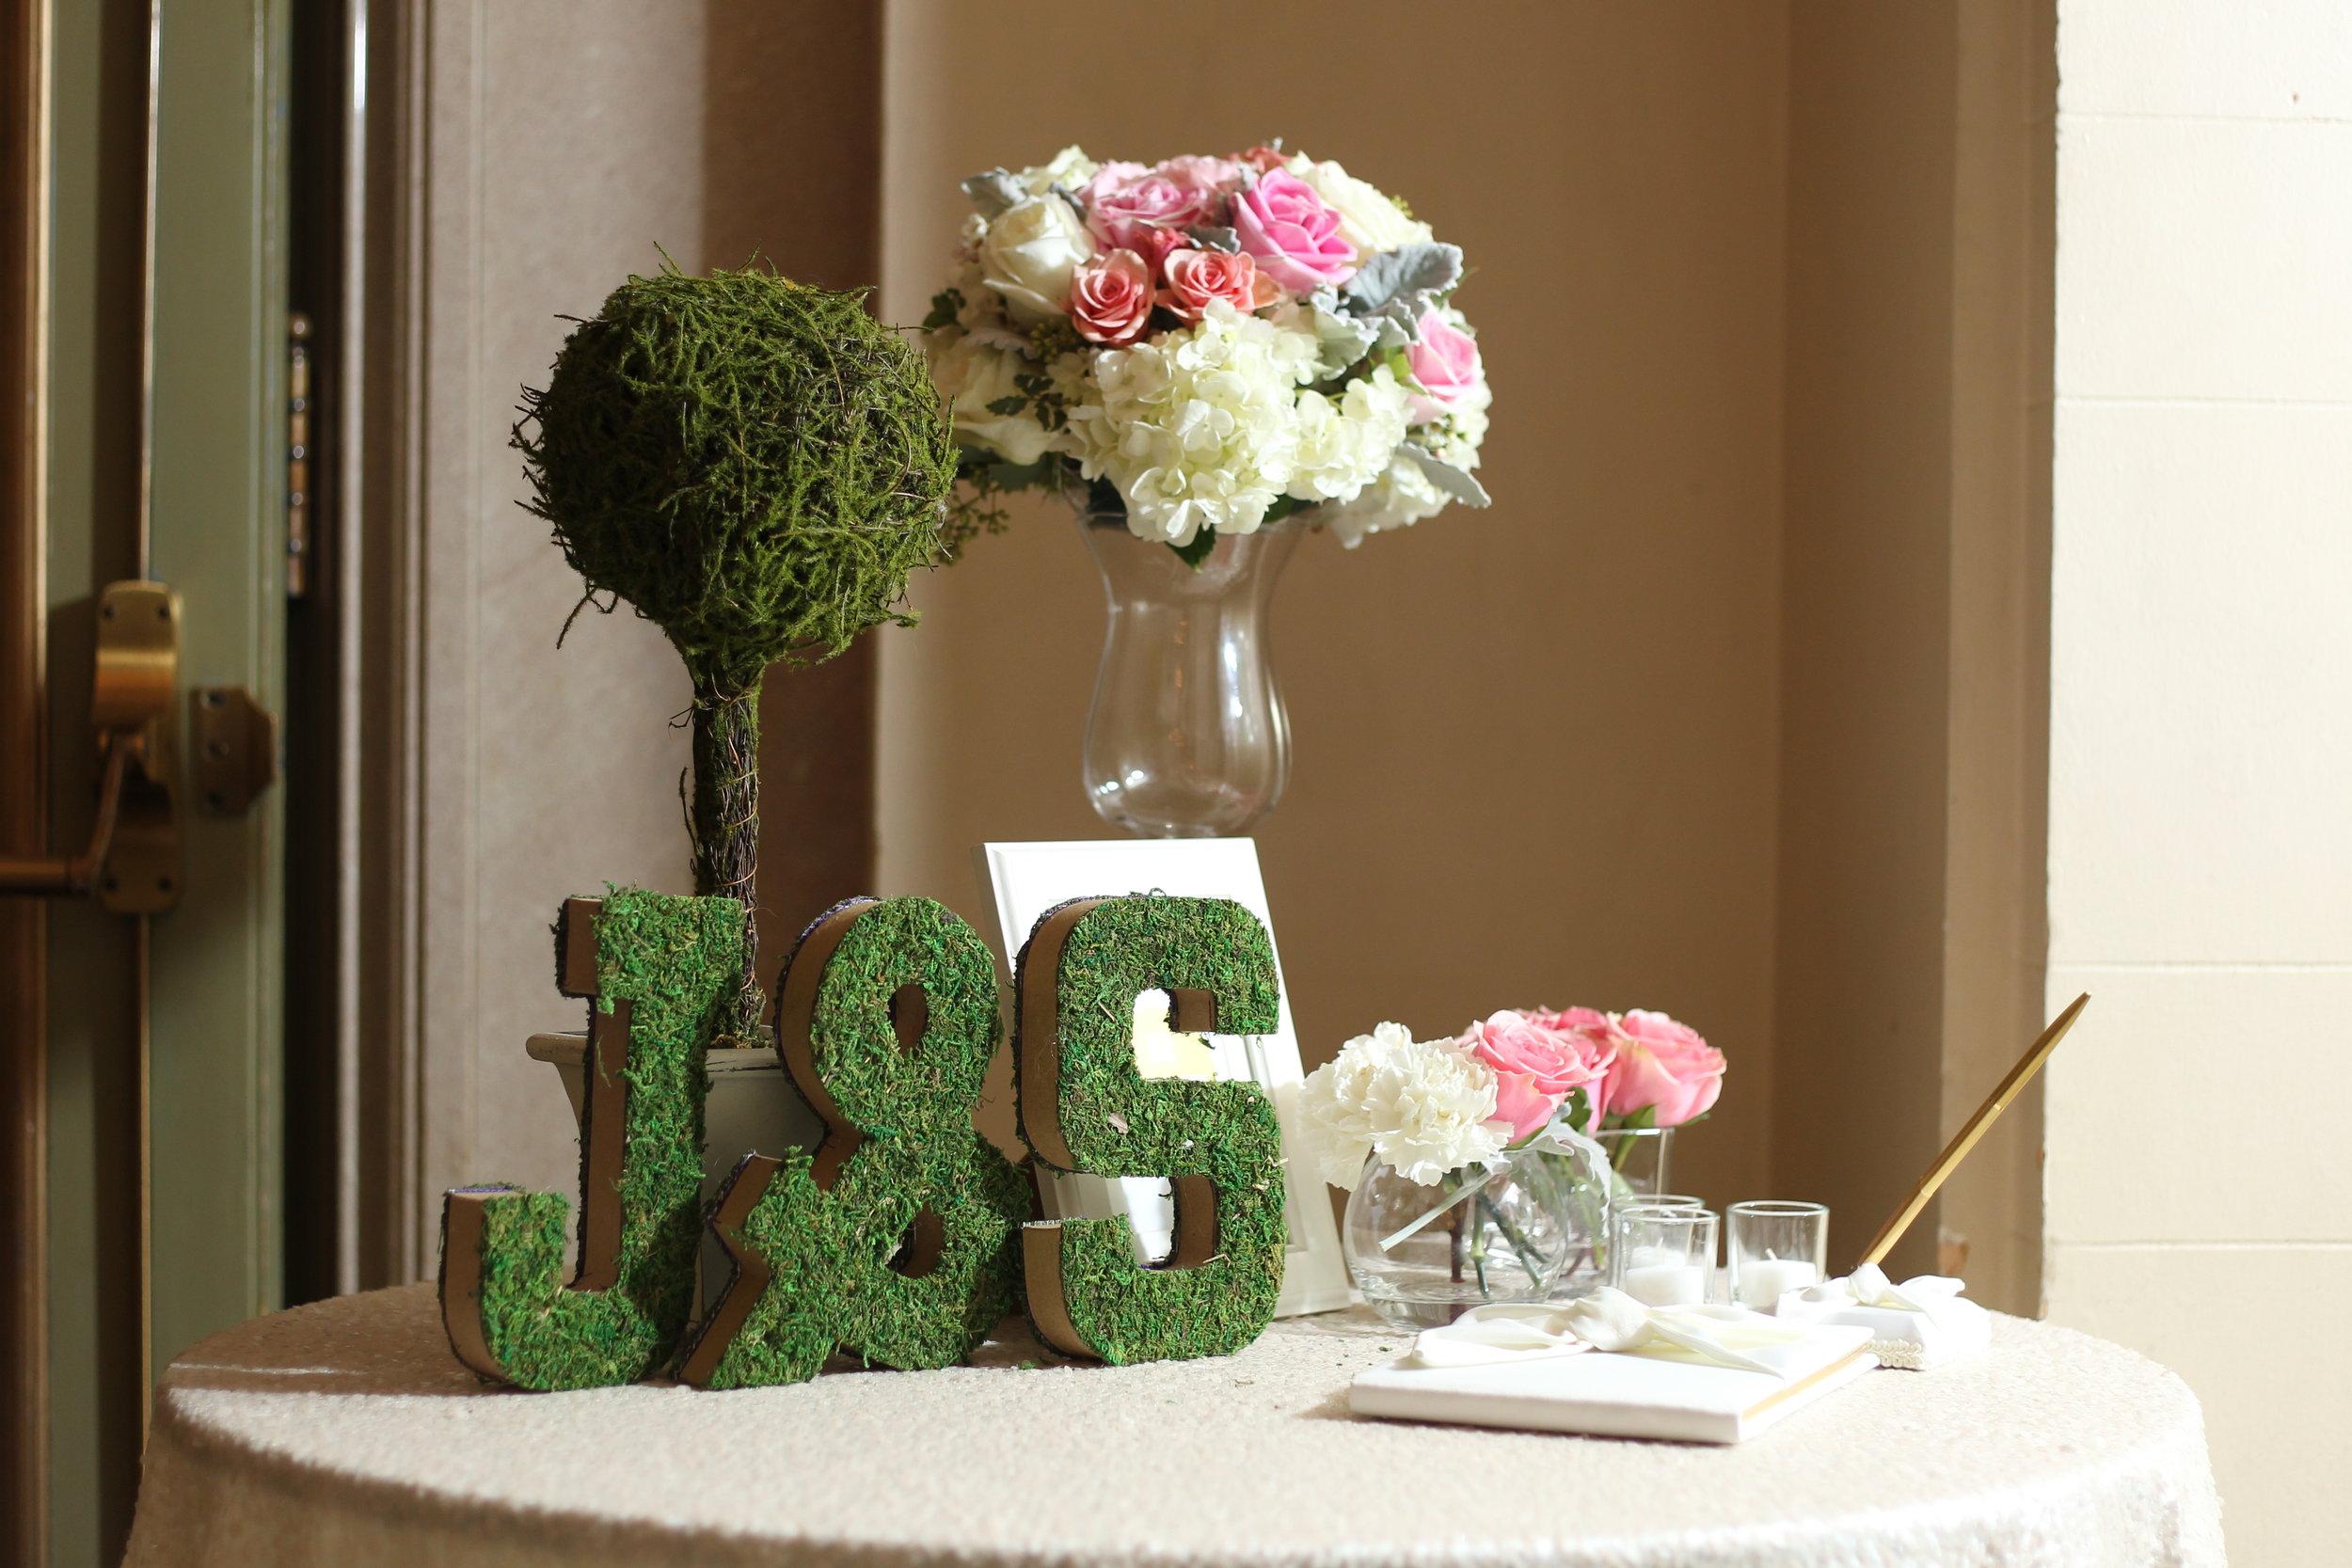 Blush_sign-in_table_arrangement.JPG